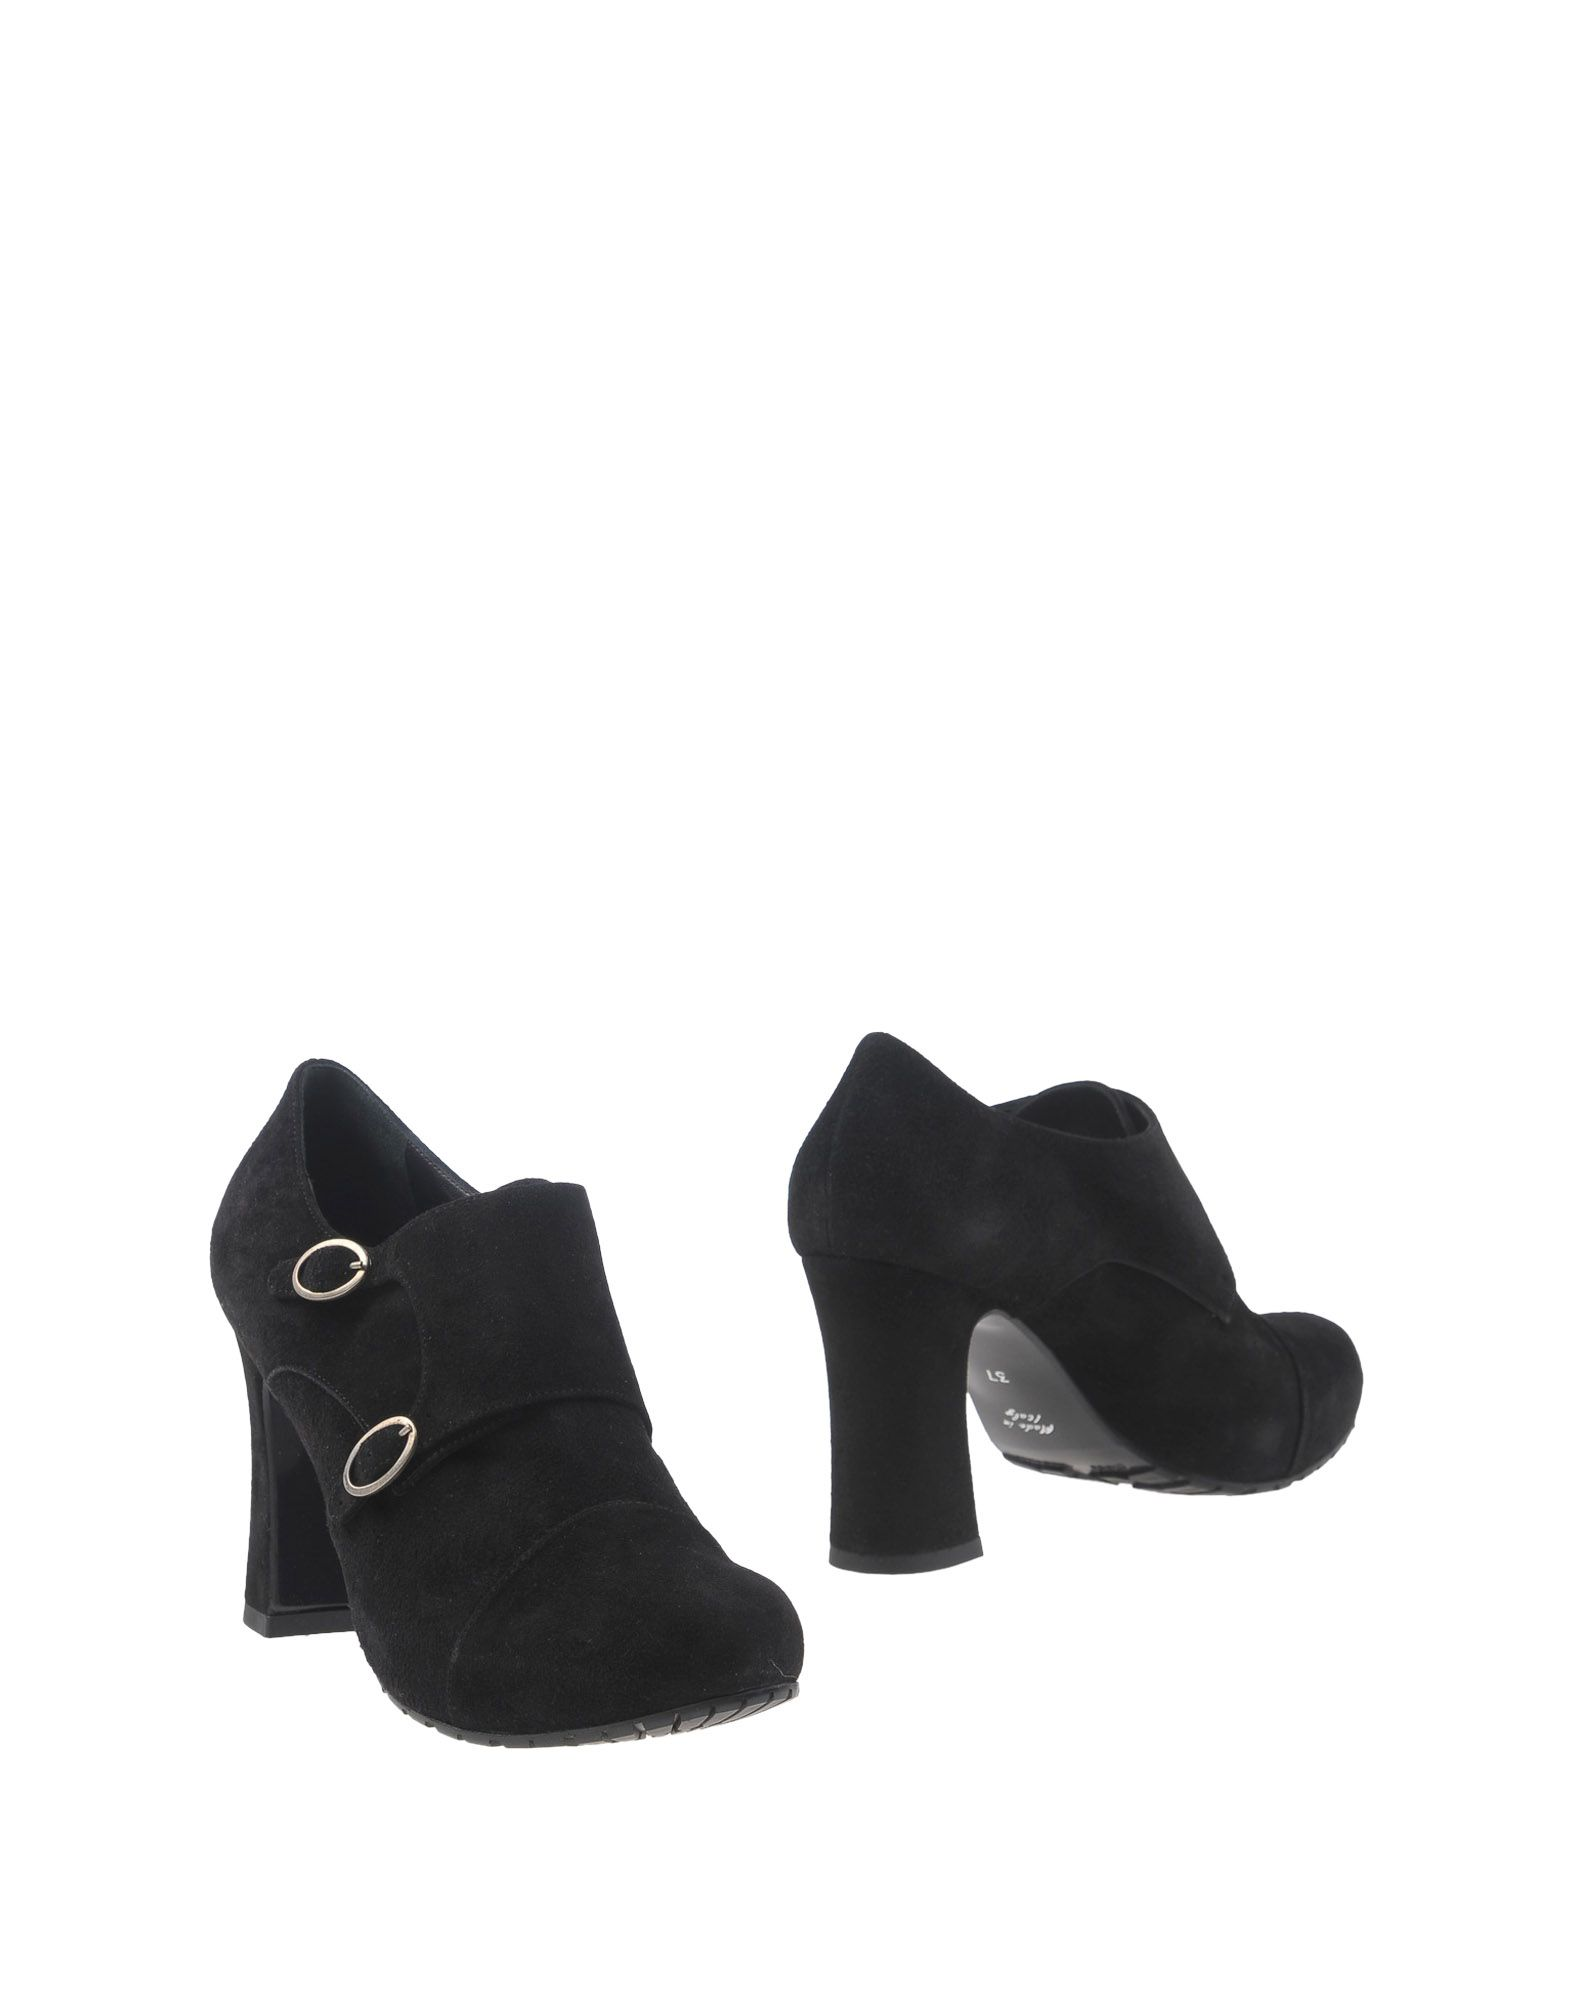 FOOTWEAR - Ankle boots on YOOX.COM Gionata hBTr5VRd